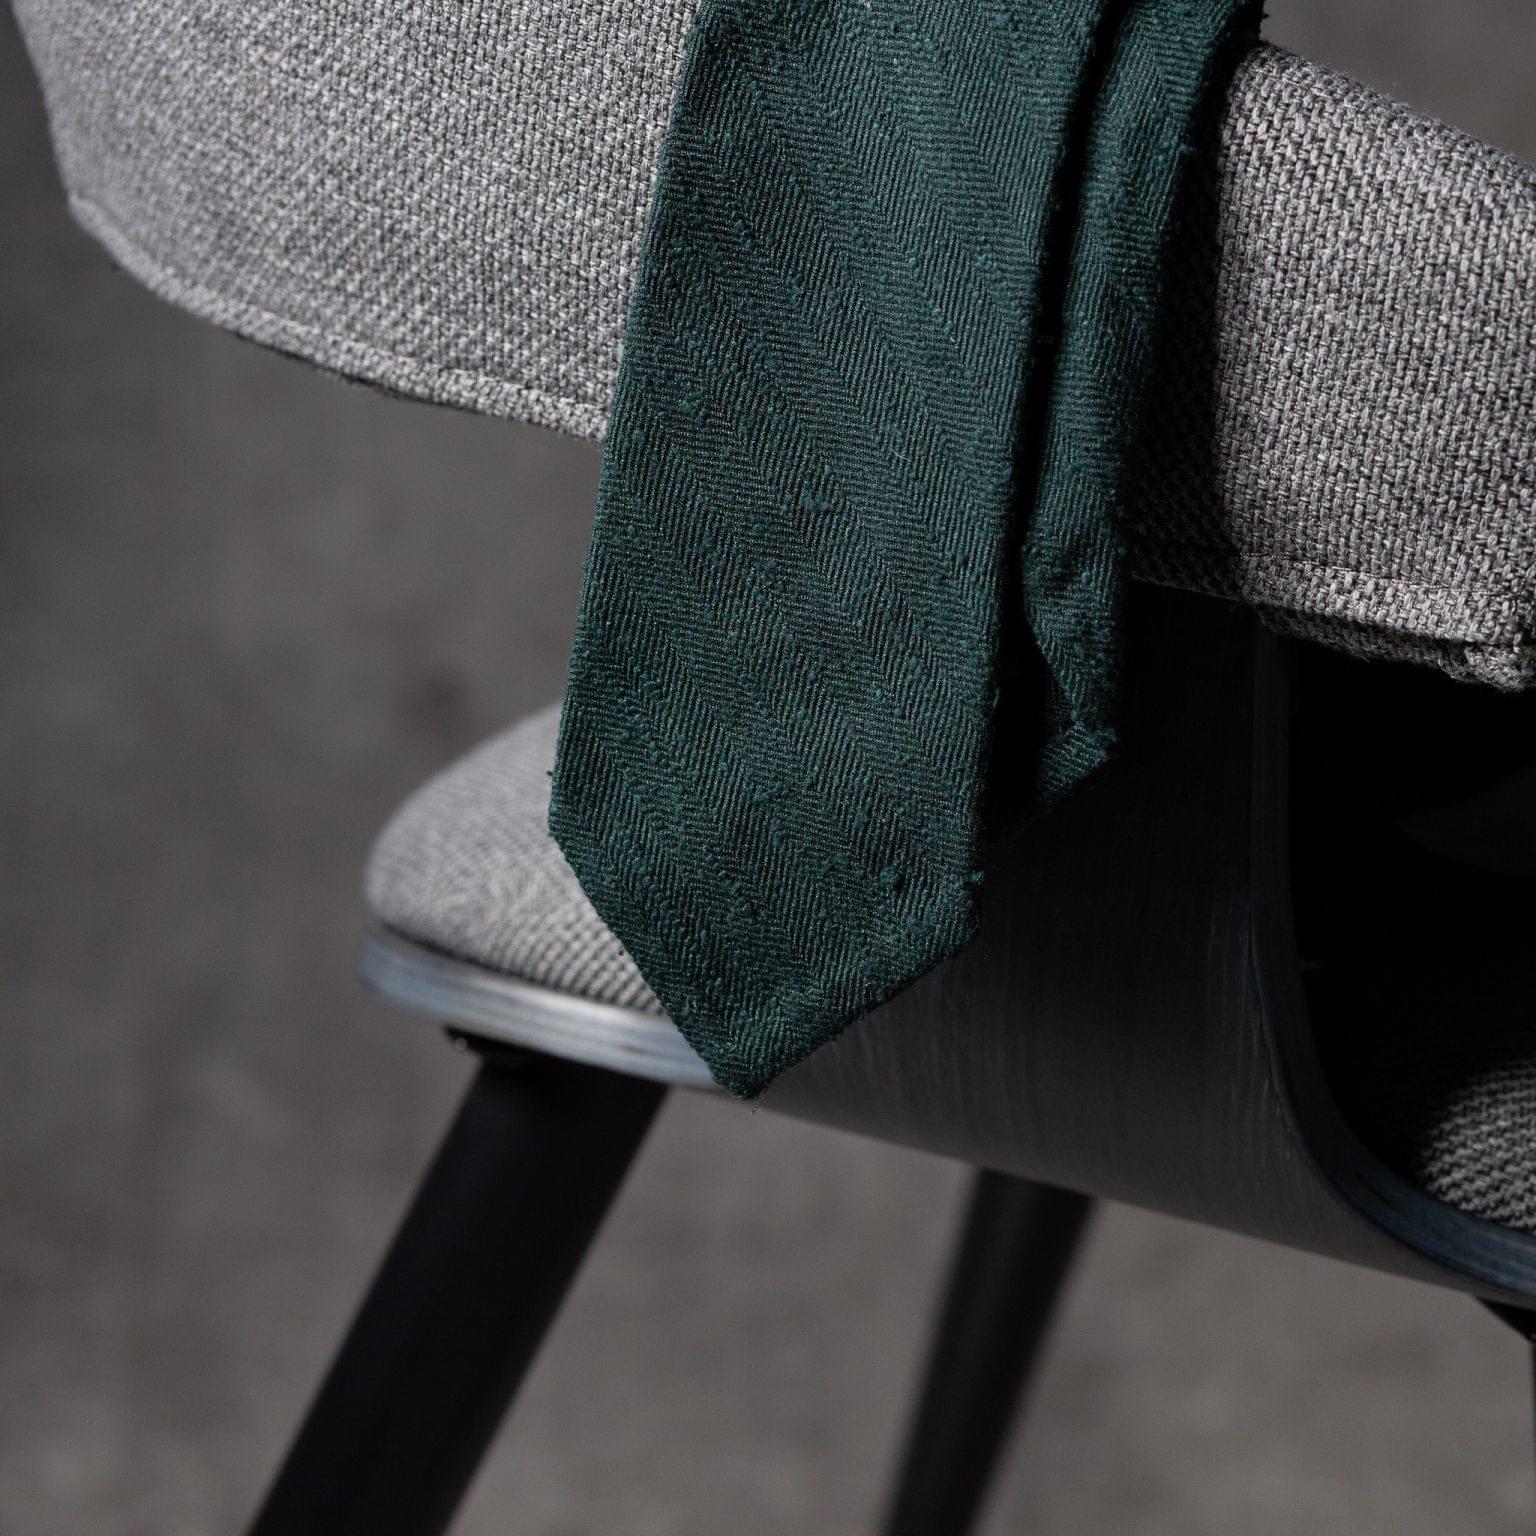 SHANTUNG-0359-Tie-Initials-Corbata-Iniciales-The-Seelk-2